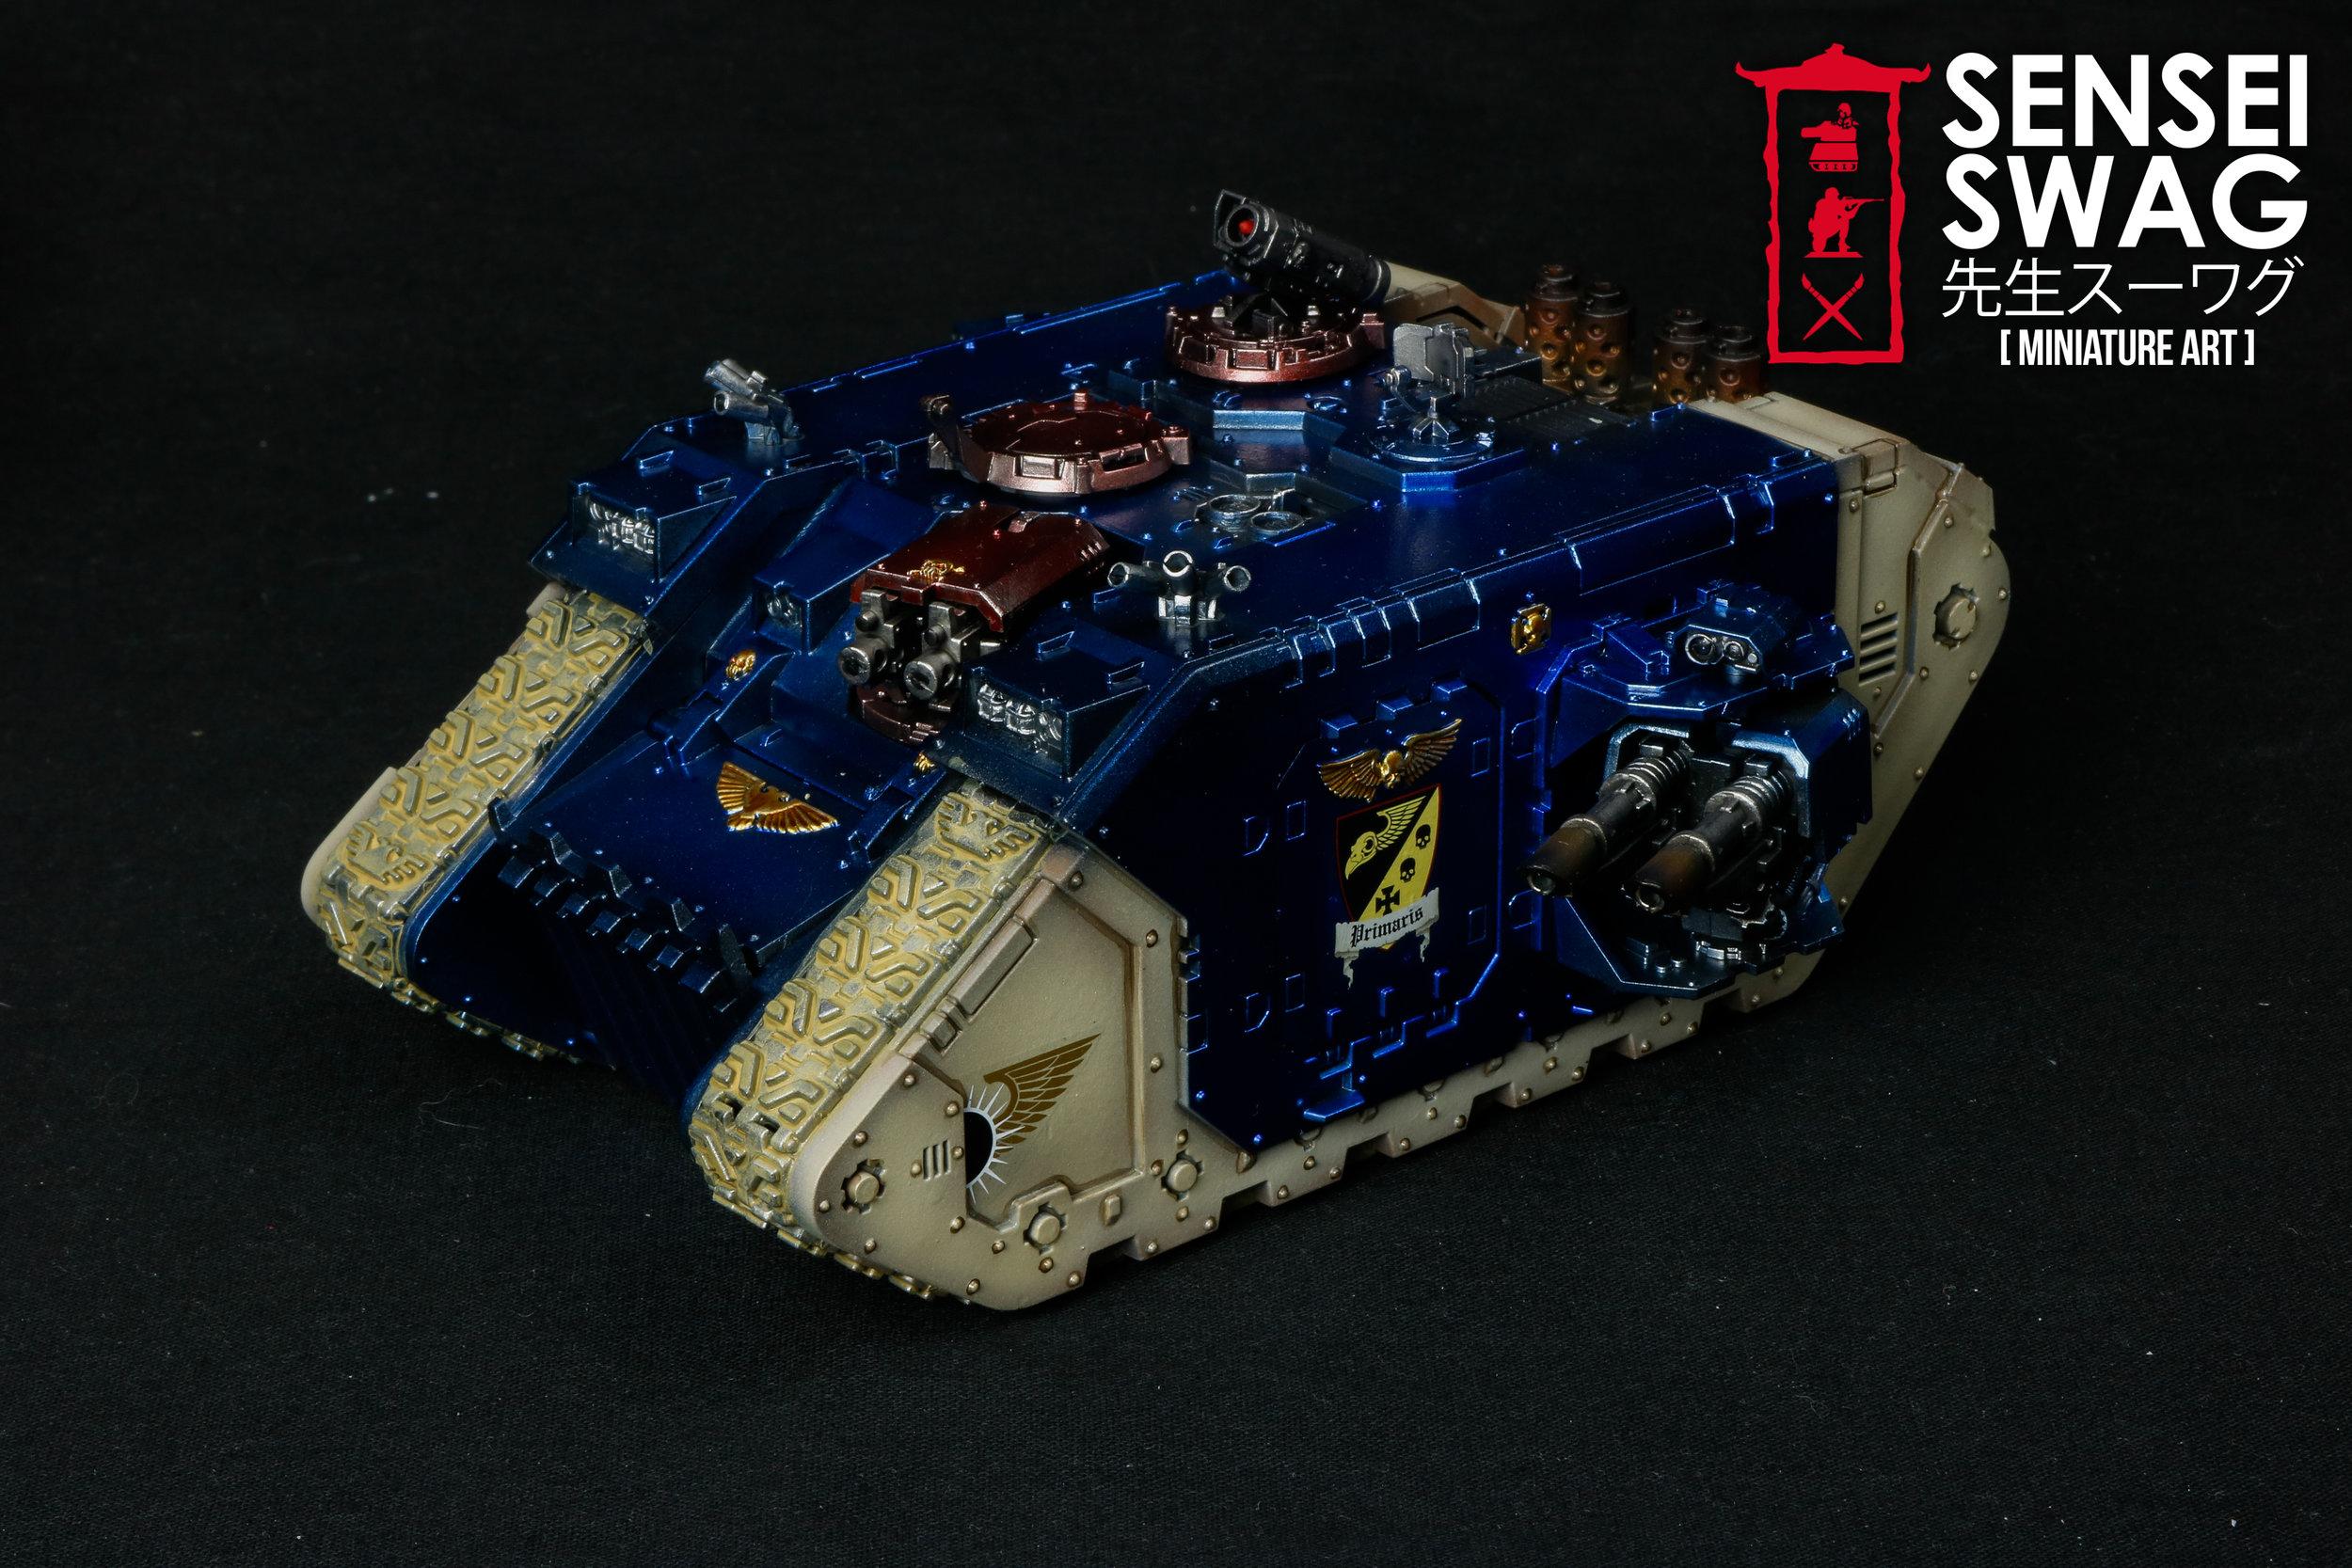 Fulminators Primaris Space Marines Redemptor Dreadnought Intercessors Repulsor Aggressors Terminators Hellblaster Captain-3.jpg